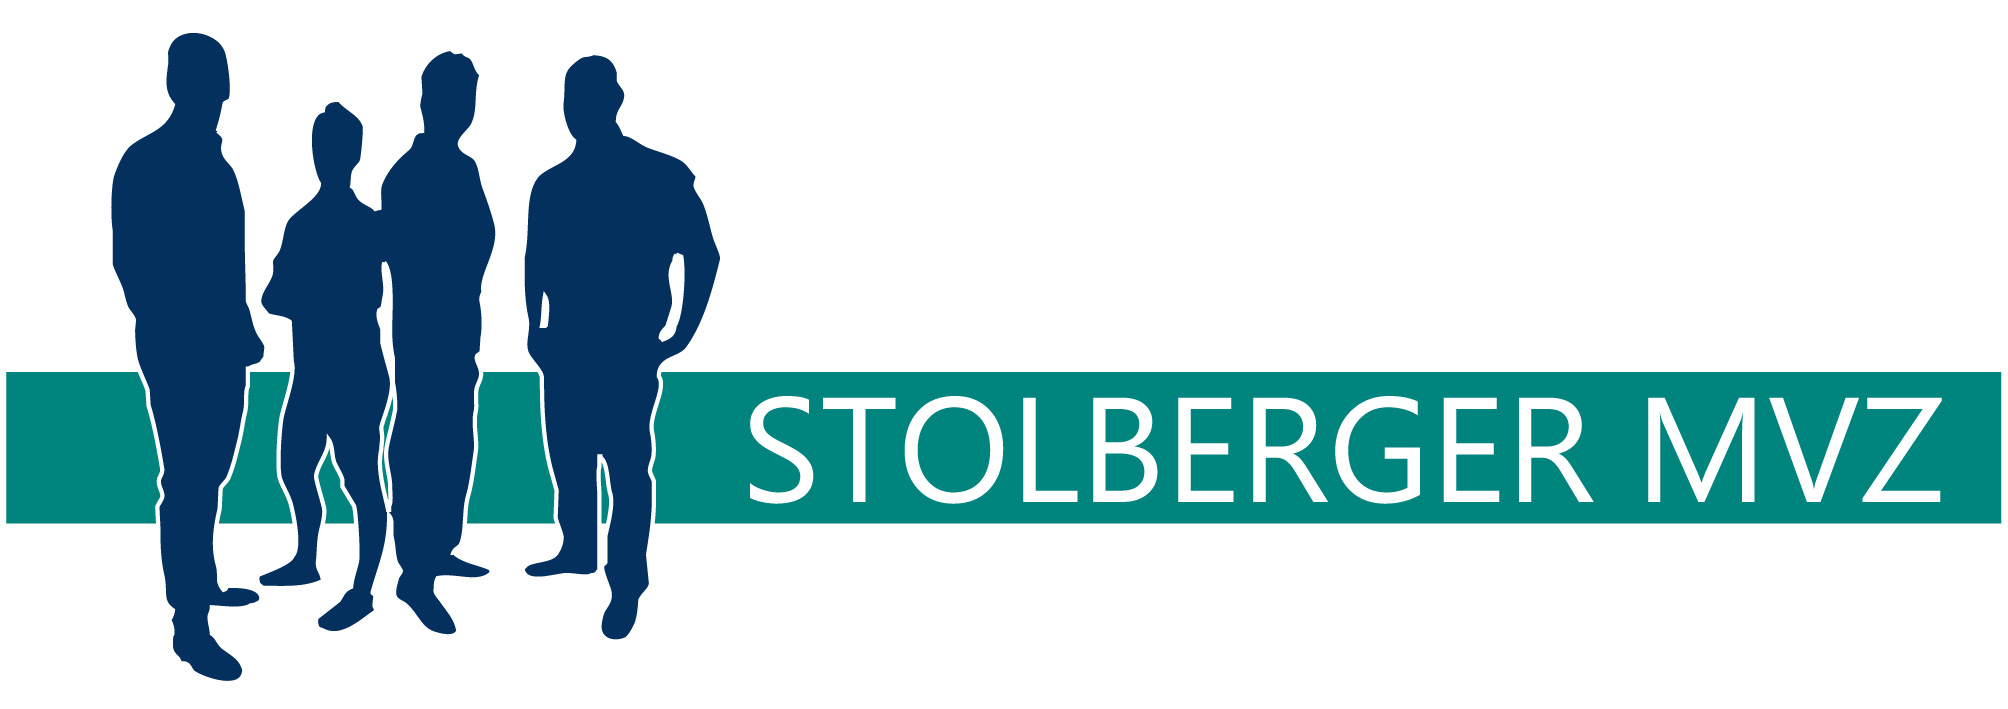 Stolberger MVZ